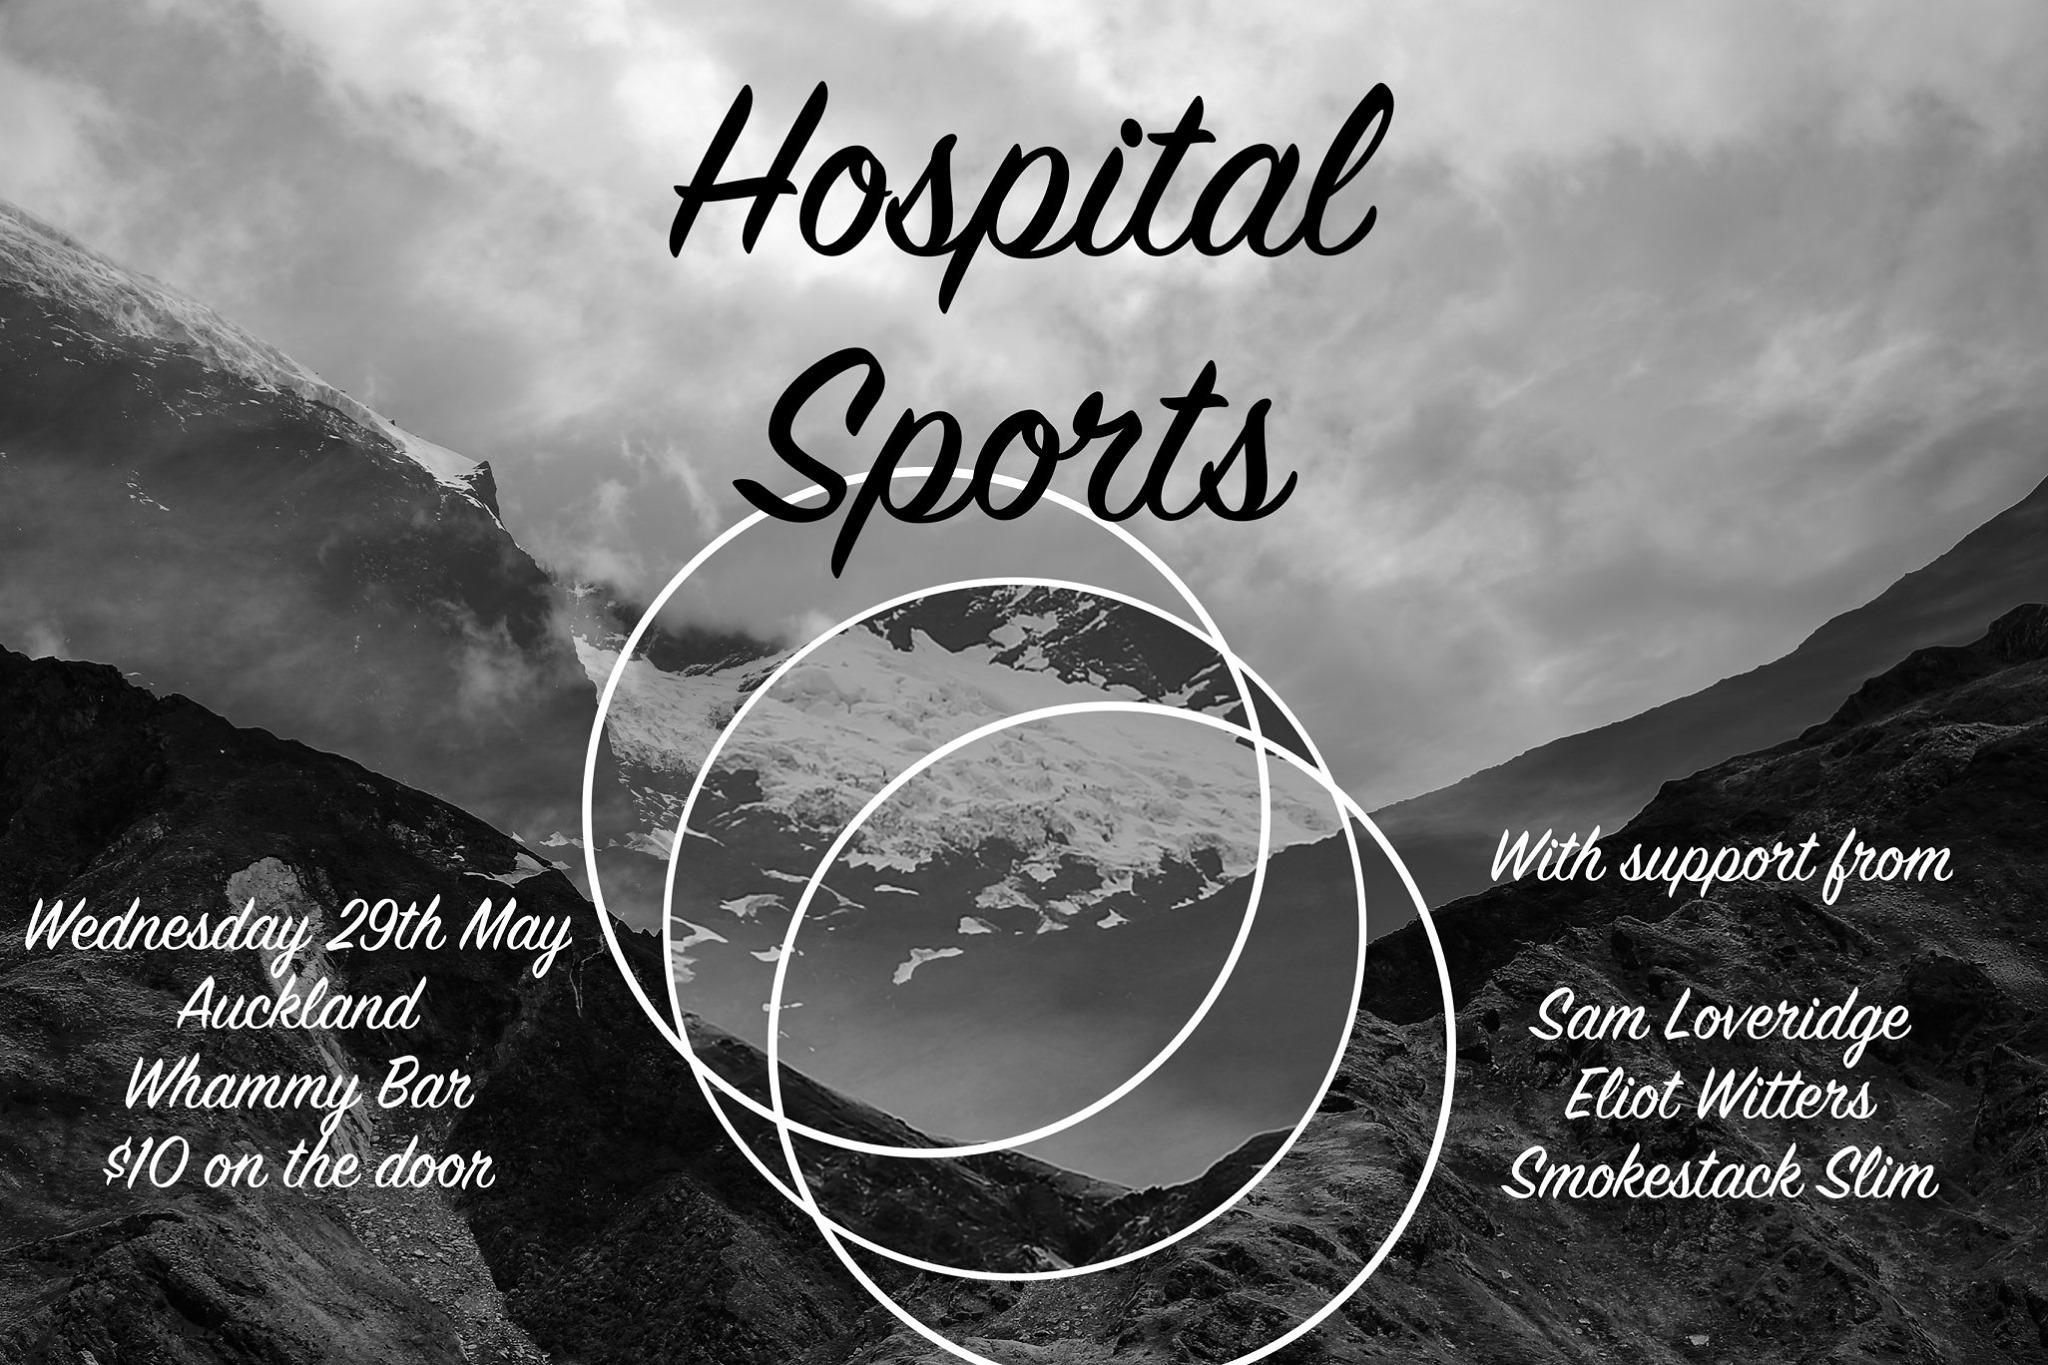 Hospital Sports